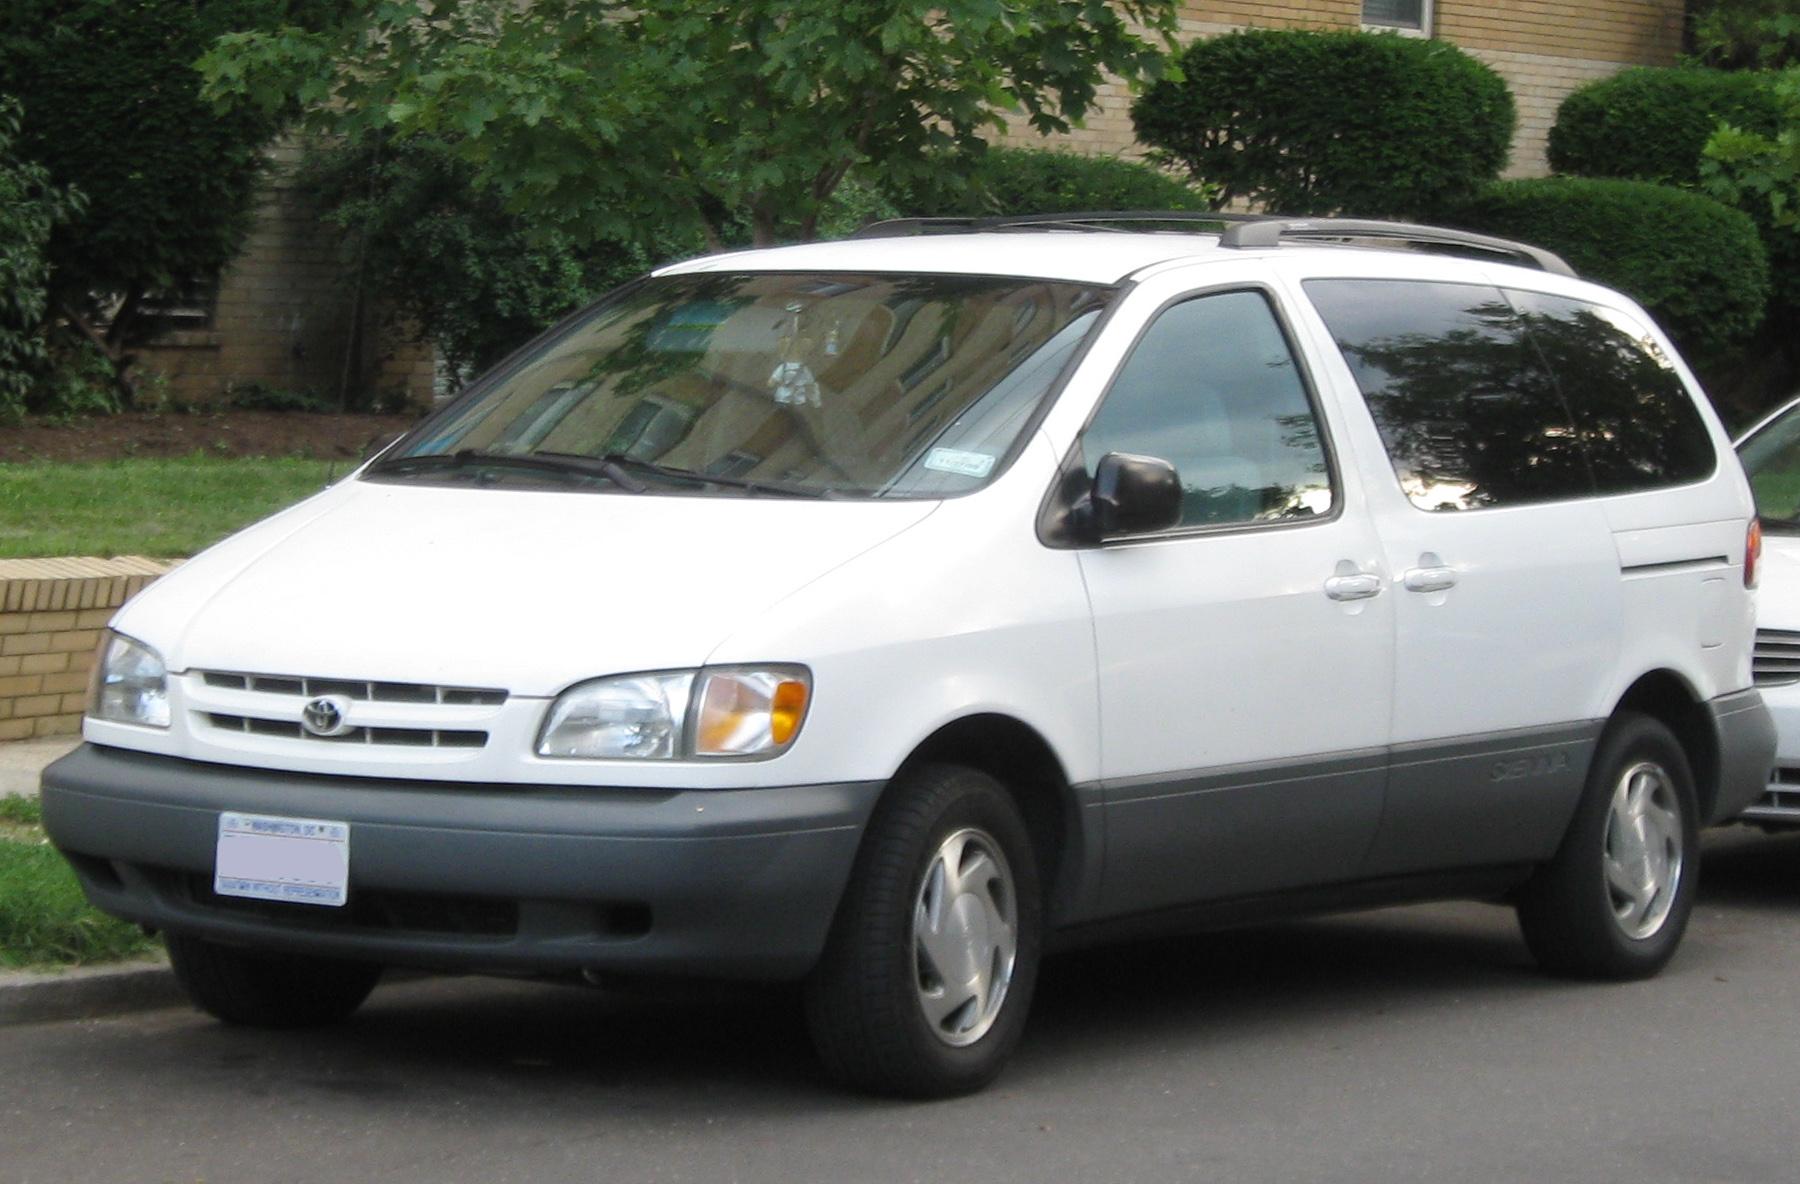 File:Toyota Sienna -- 07-09-2009.jpg - Wikipedia